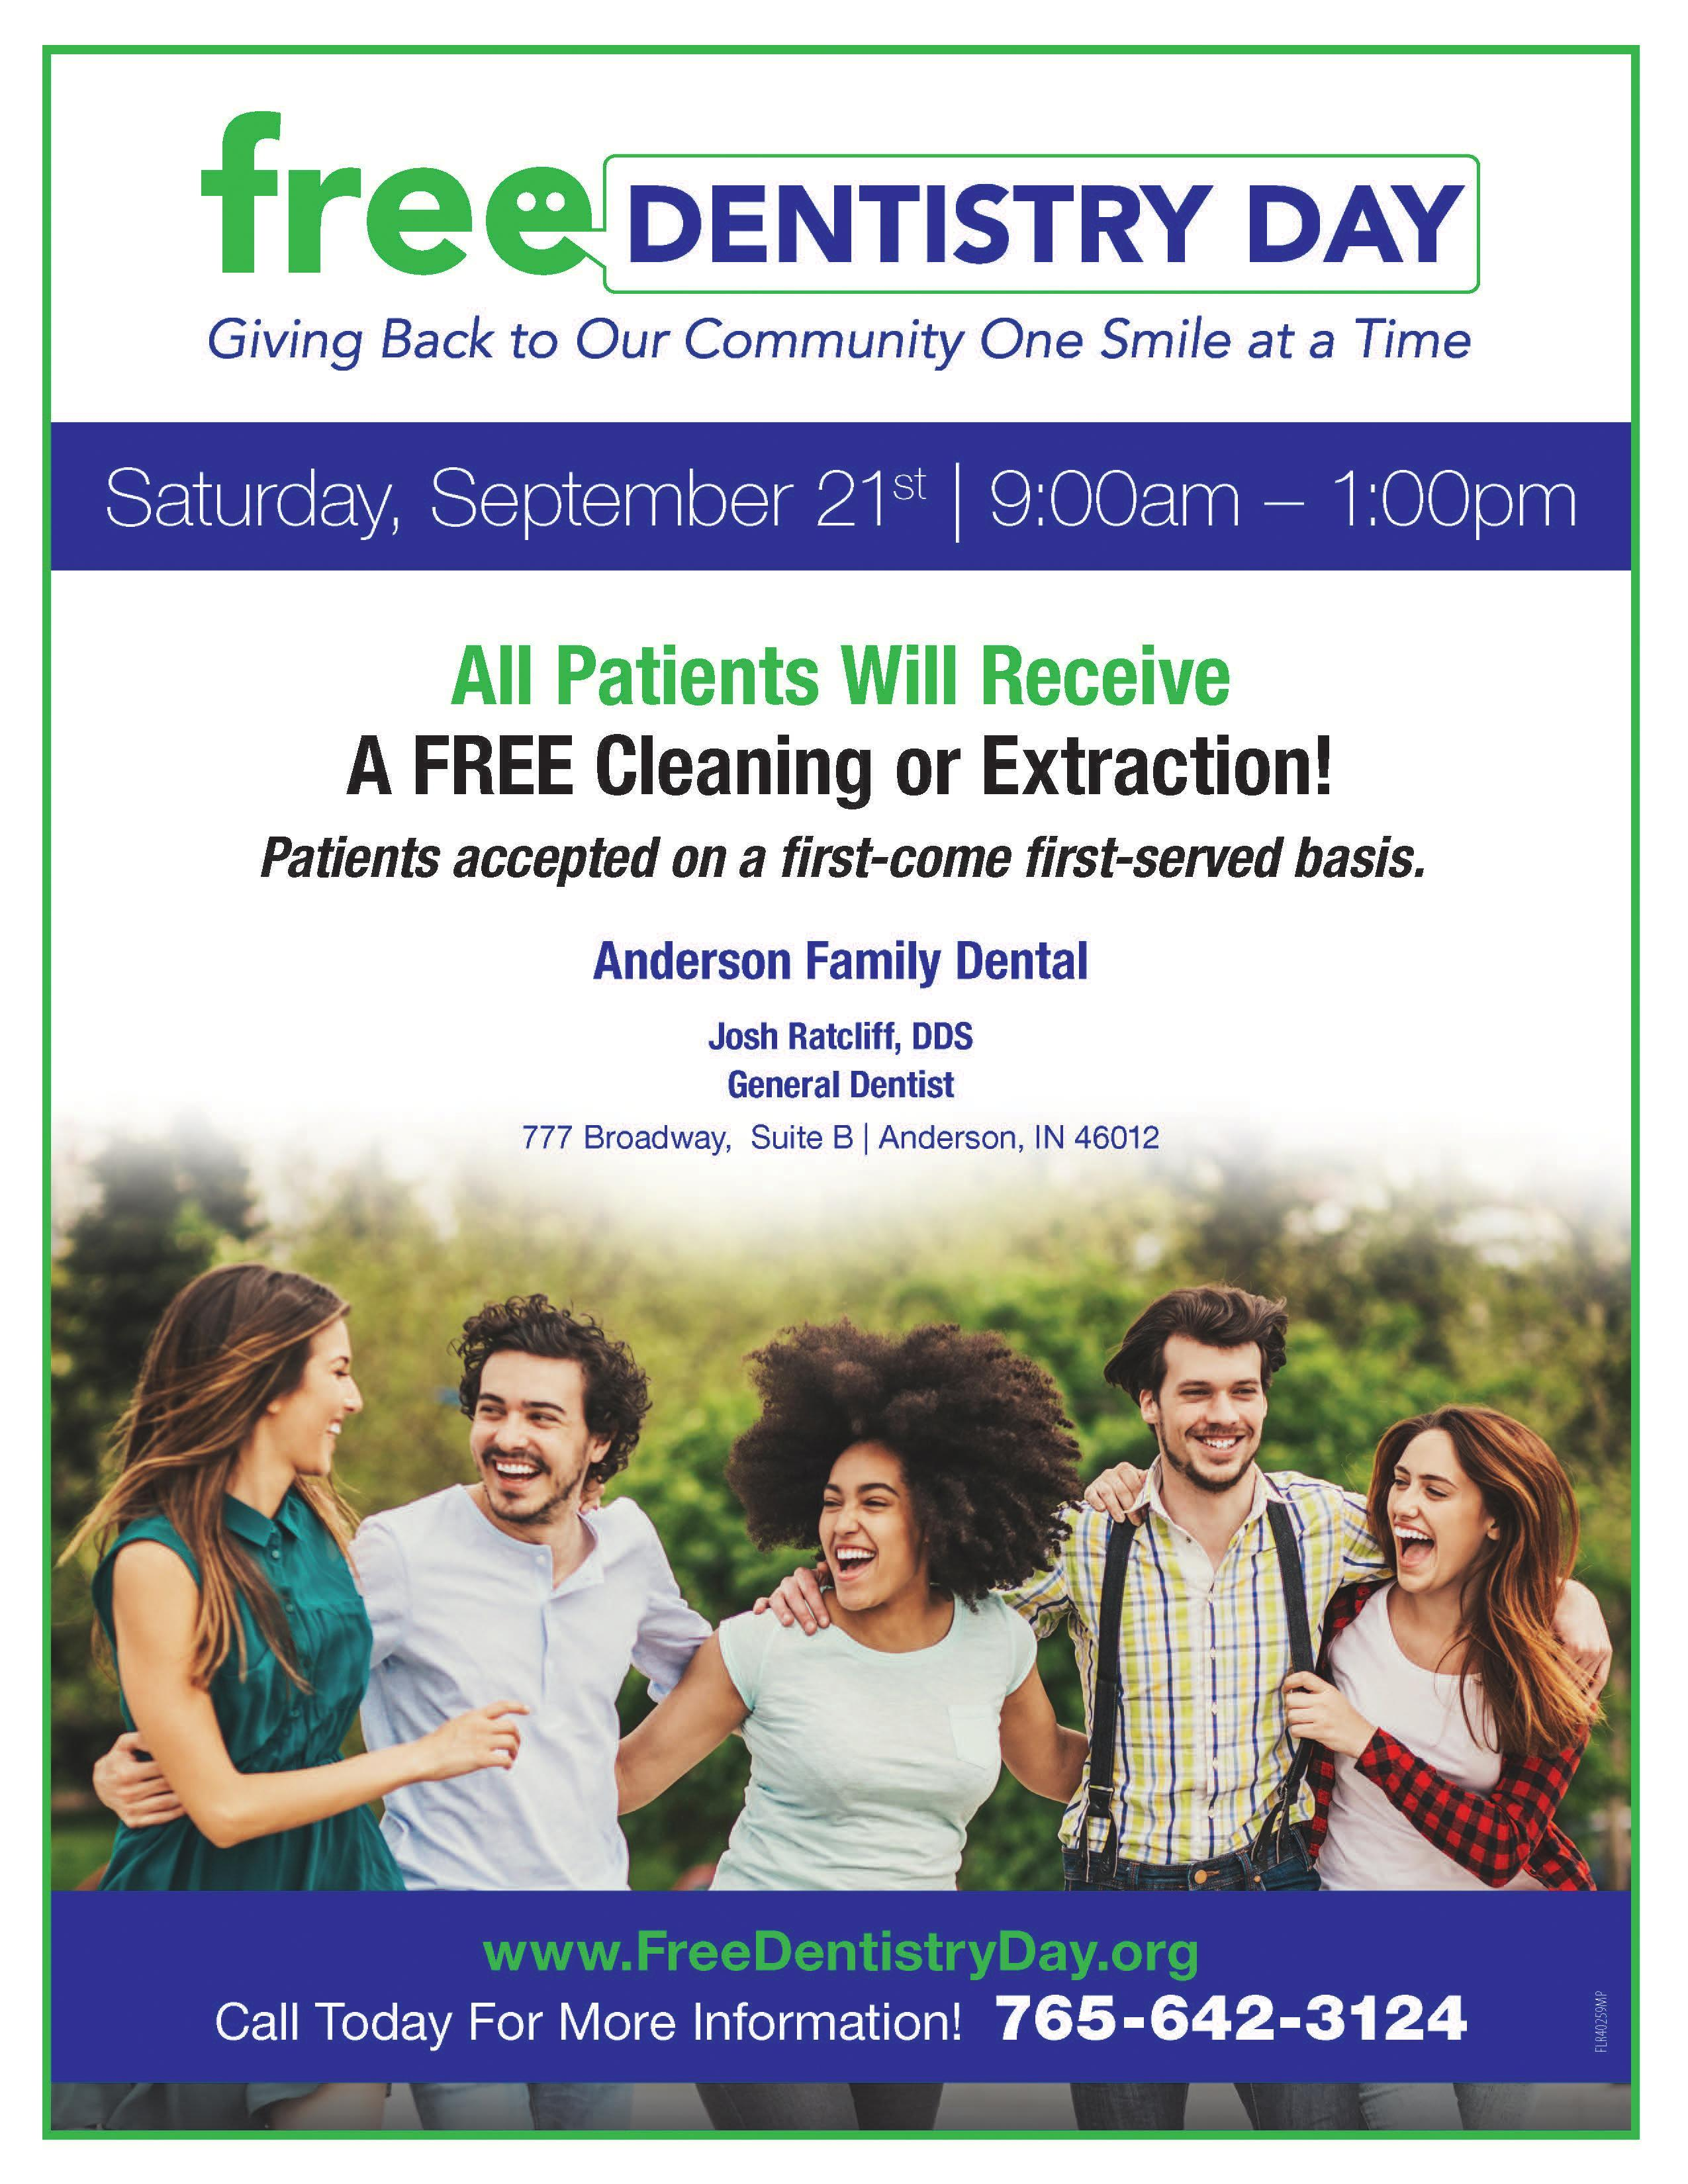 flyer for free dental work on 9 21 2019